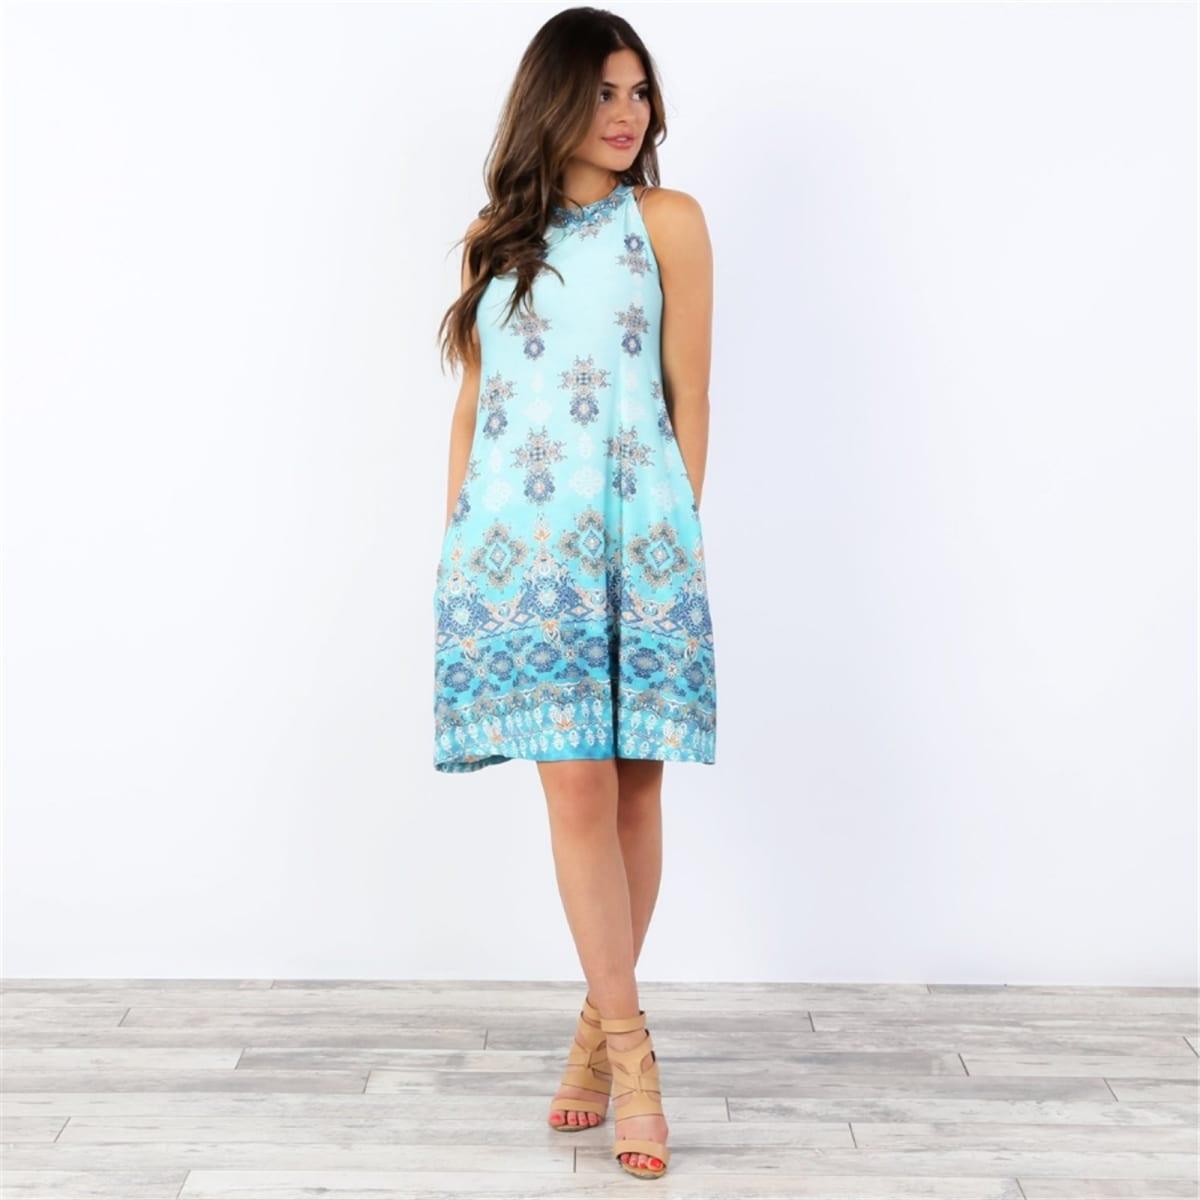 Moroccan Print Dresses